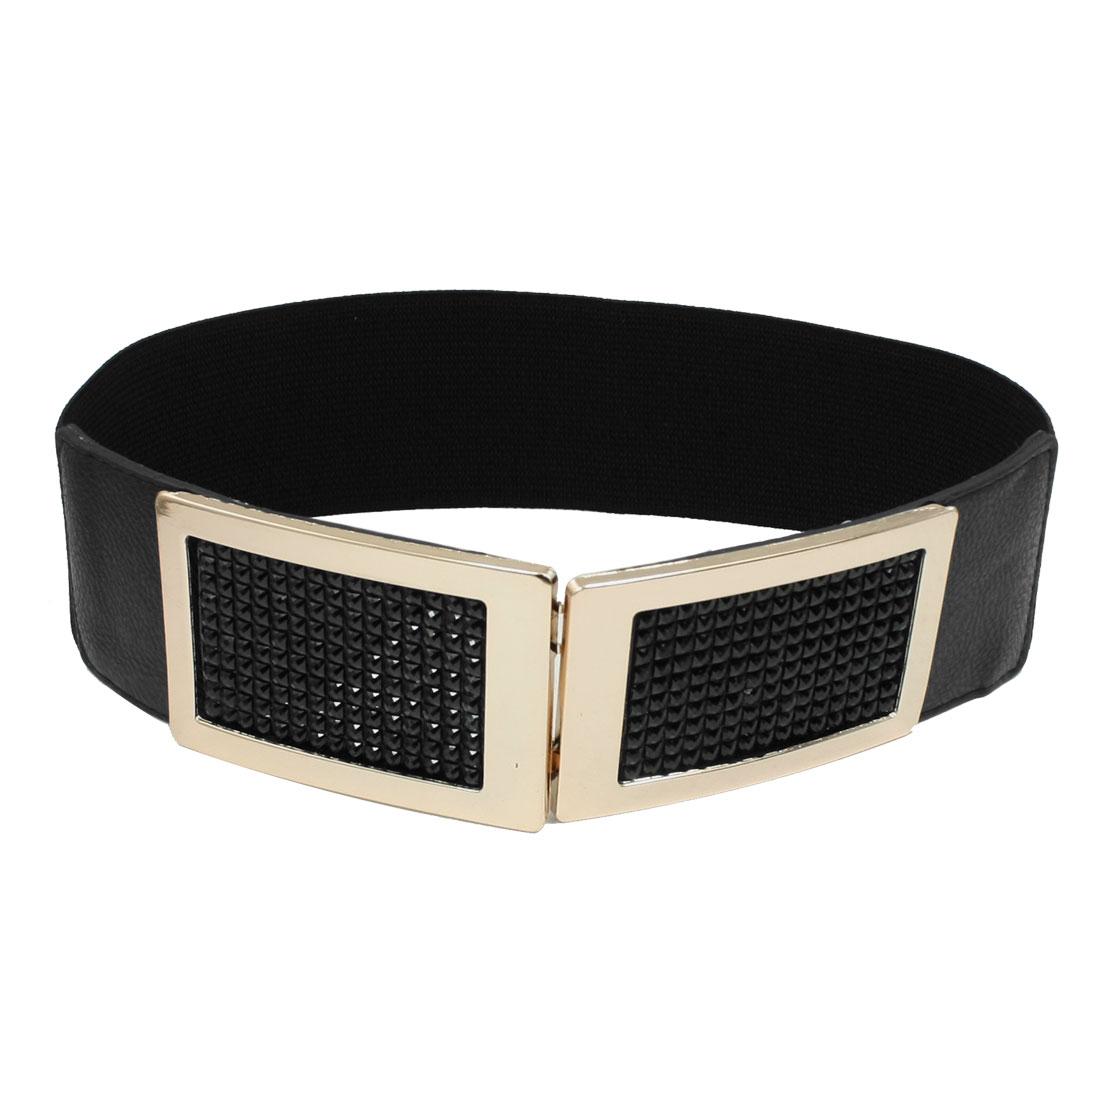 Women Facted Beads Inlaid Metal Interlocking Buckle Elastic Waist Belt Black